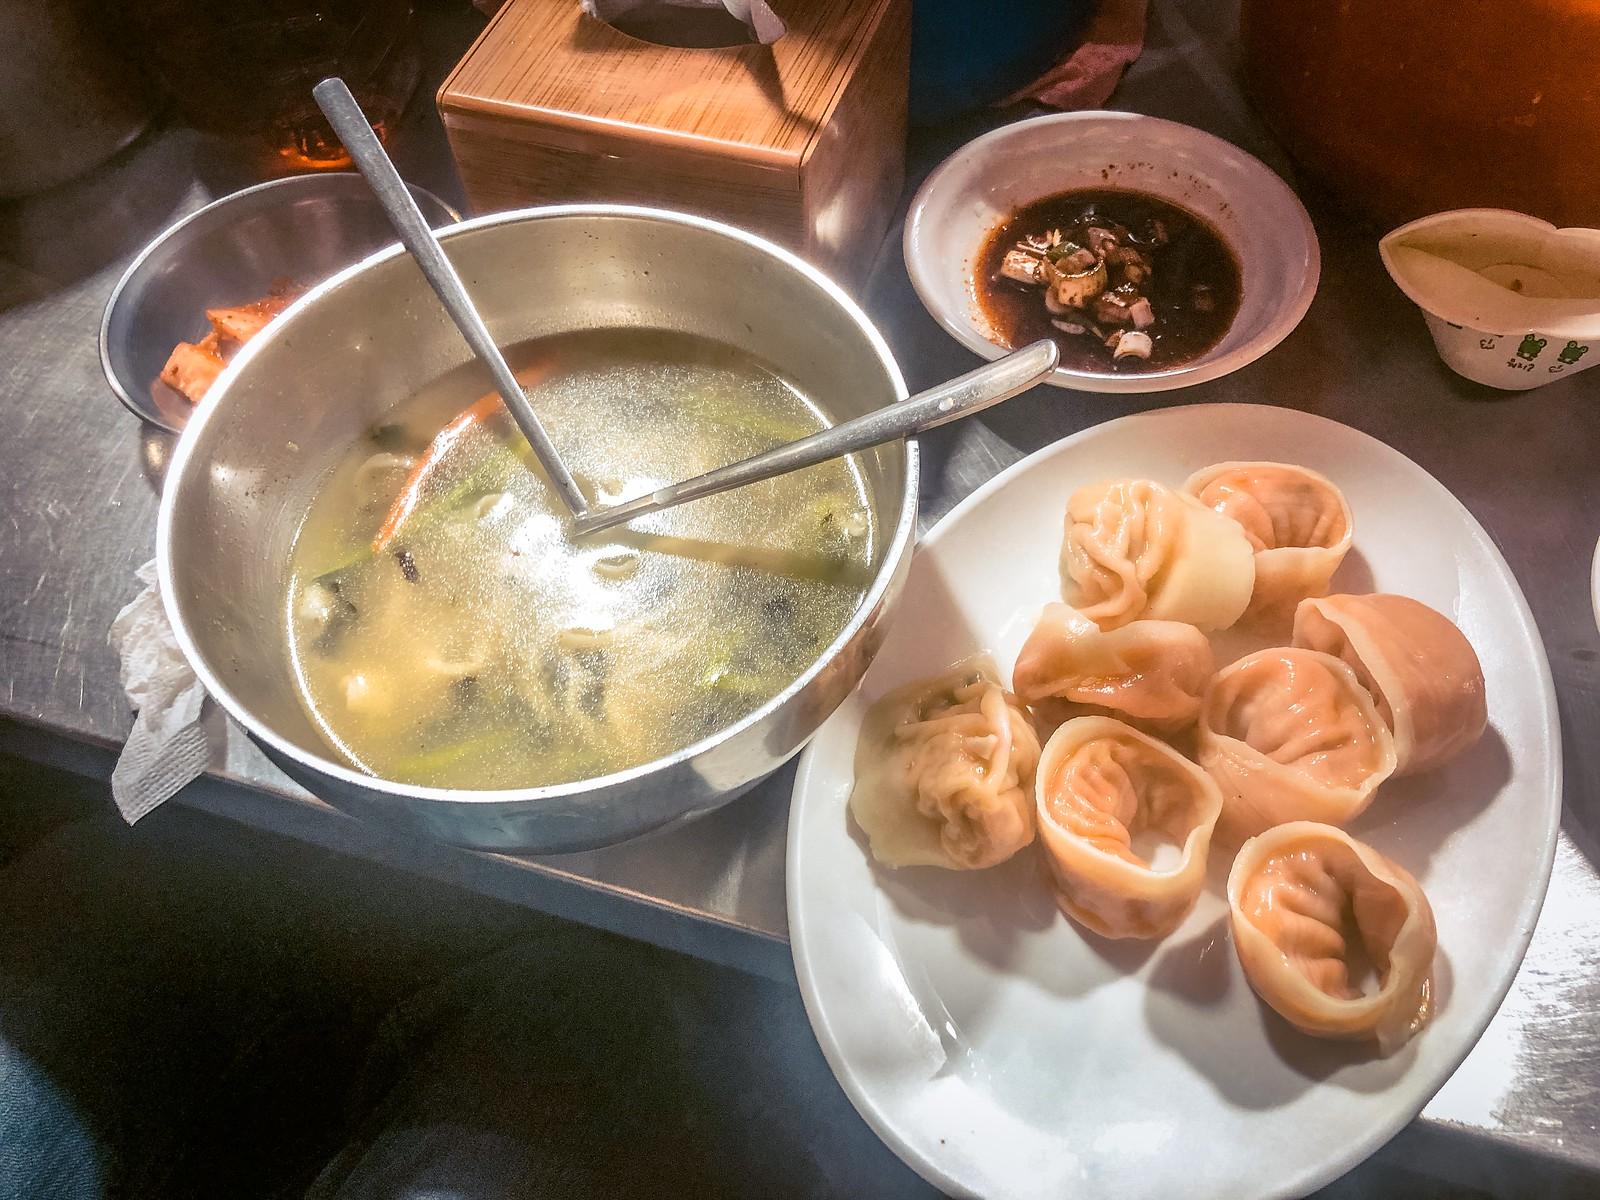 Kalguksu and Kimchi Mandu at Gwangjang Market